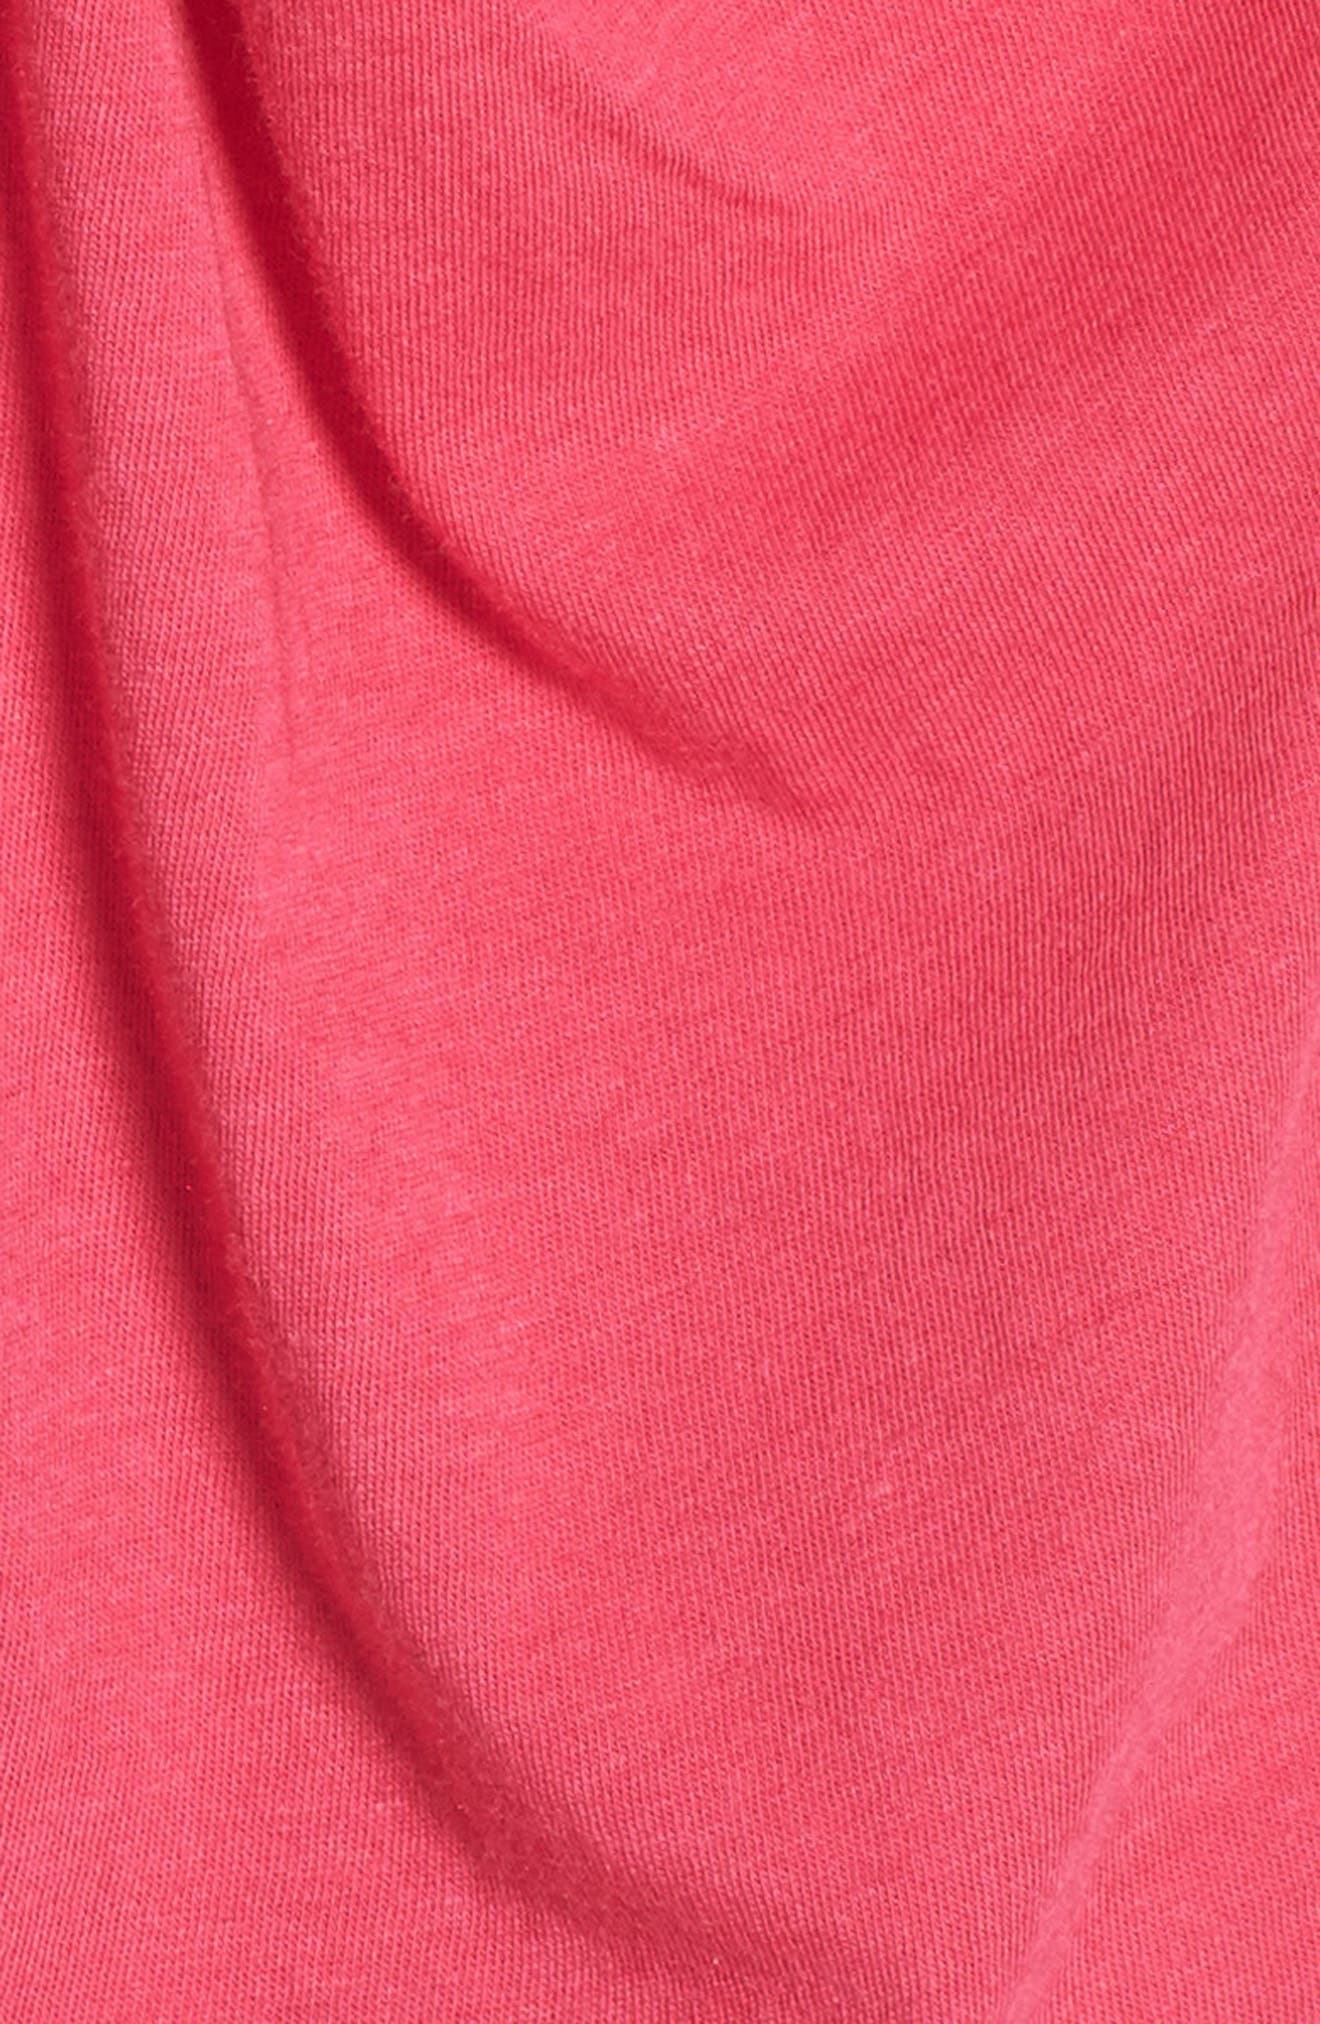 Twist Back Tee,                             Alternate thumbnail 36, color,